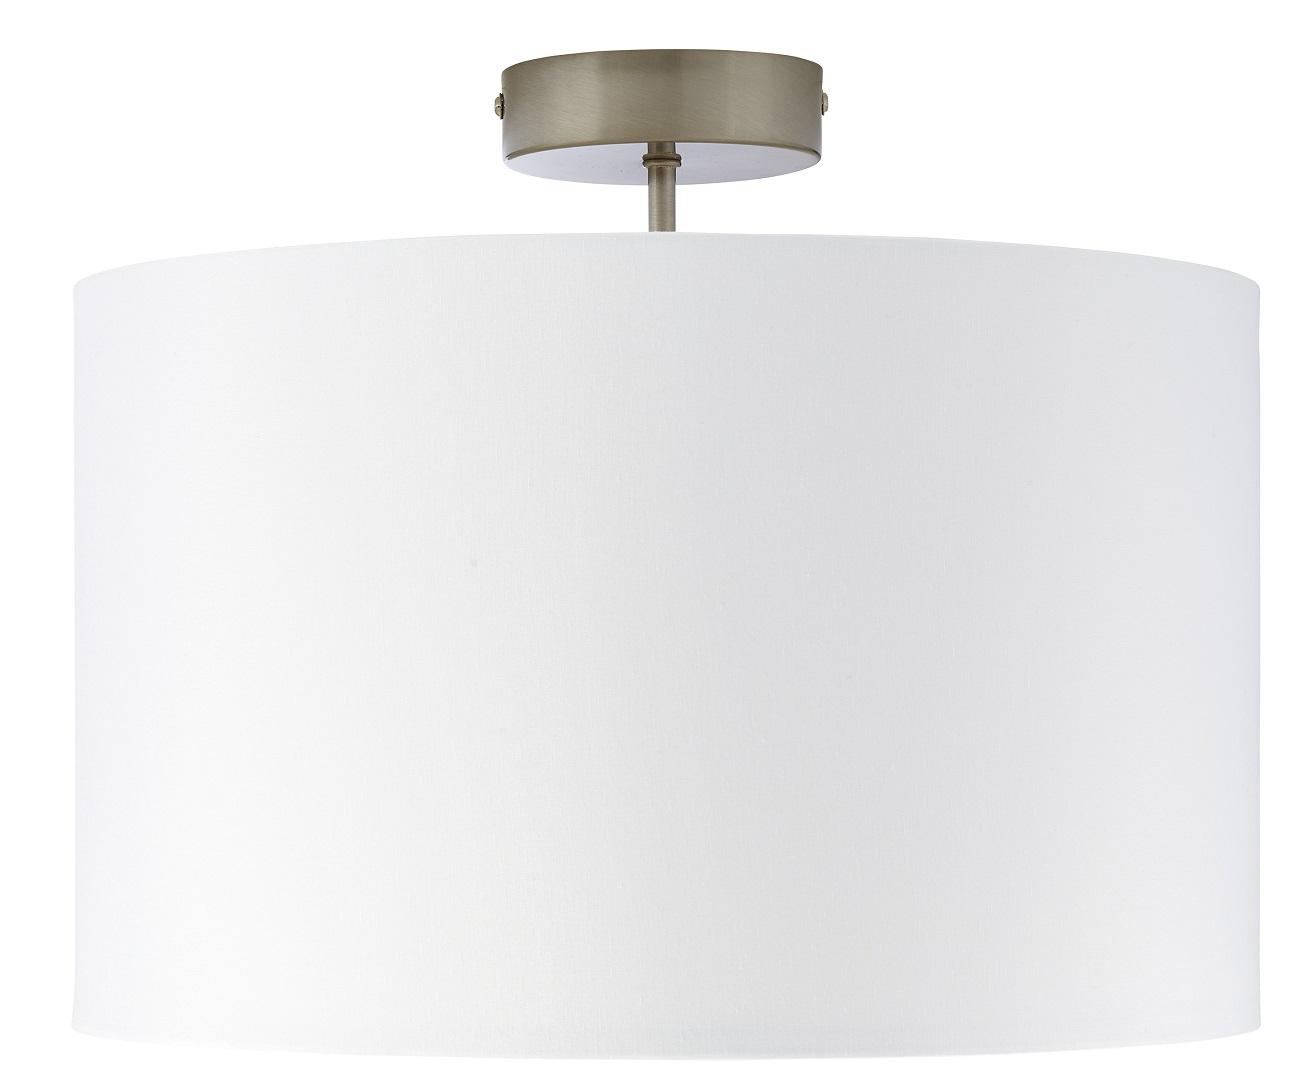 Plafondlamp Charly 1xE27 max 60Watt in wit   Brilliant